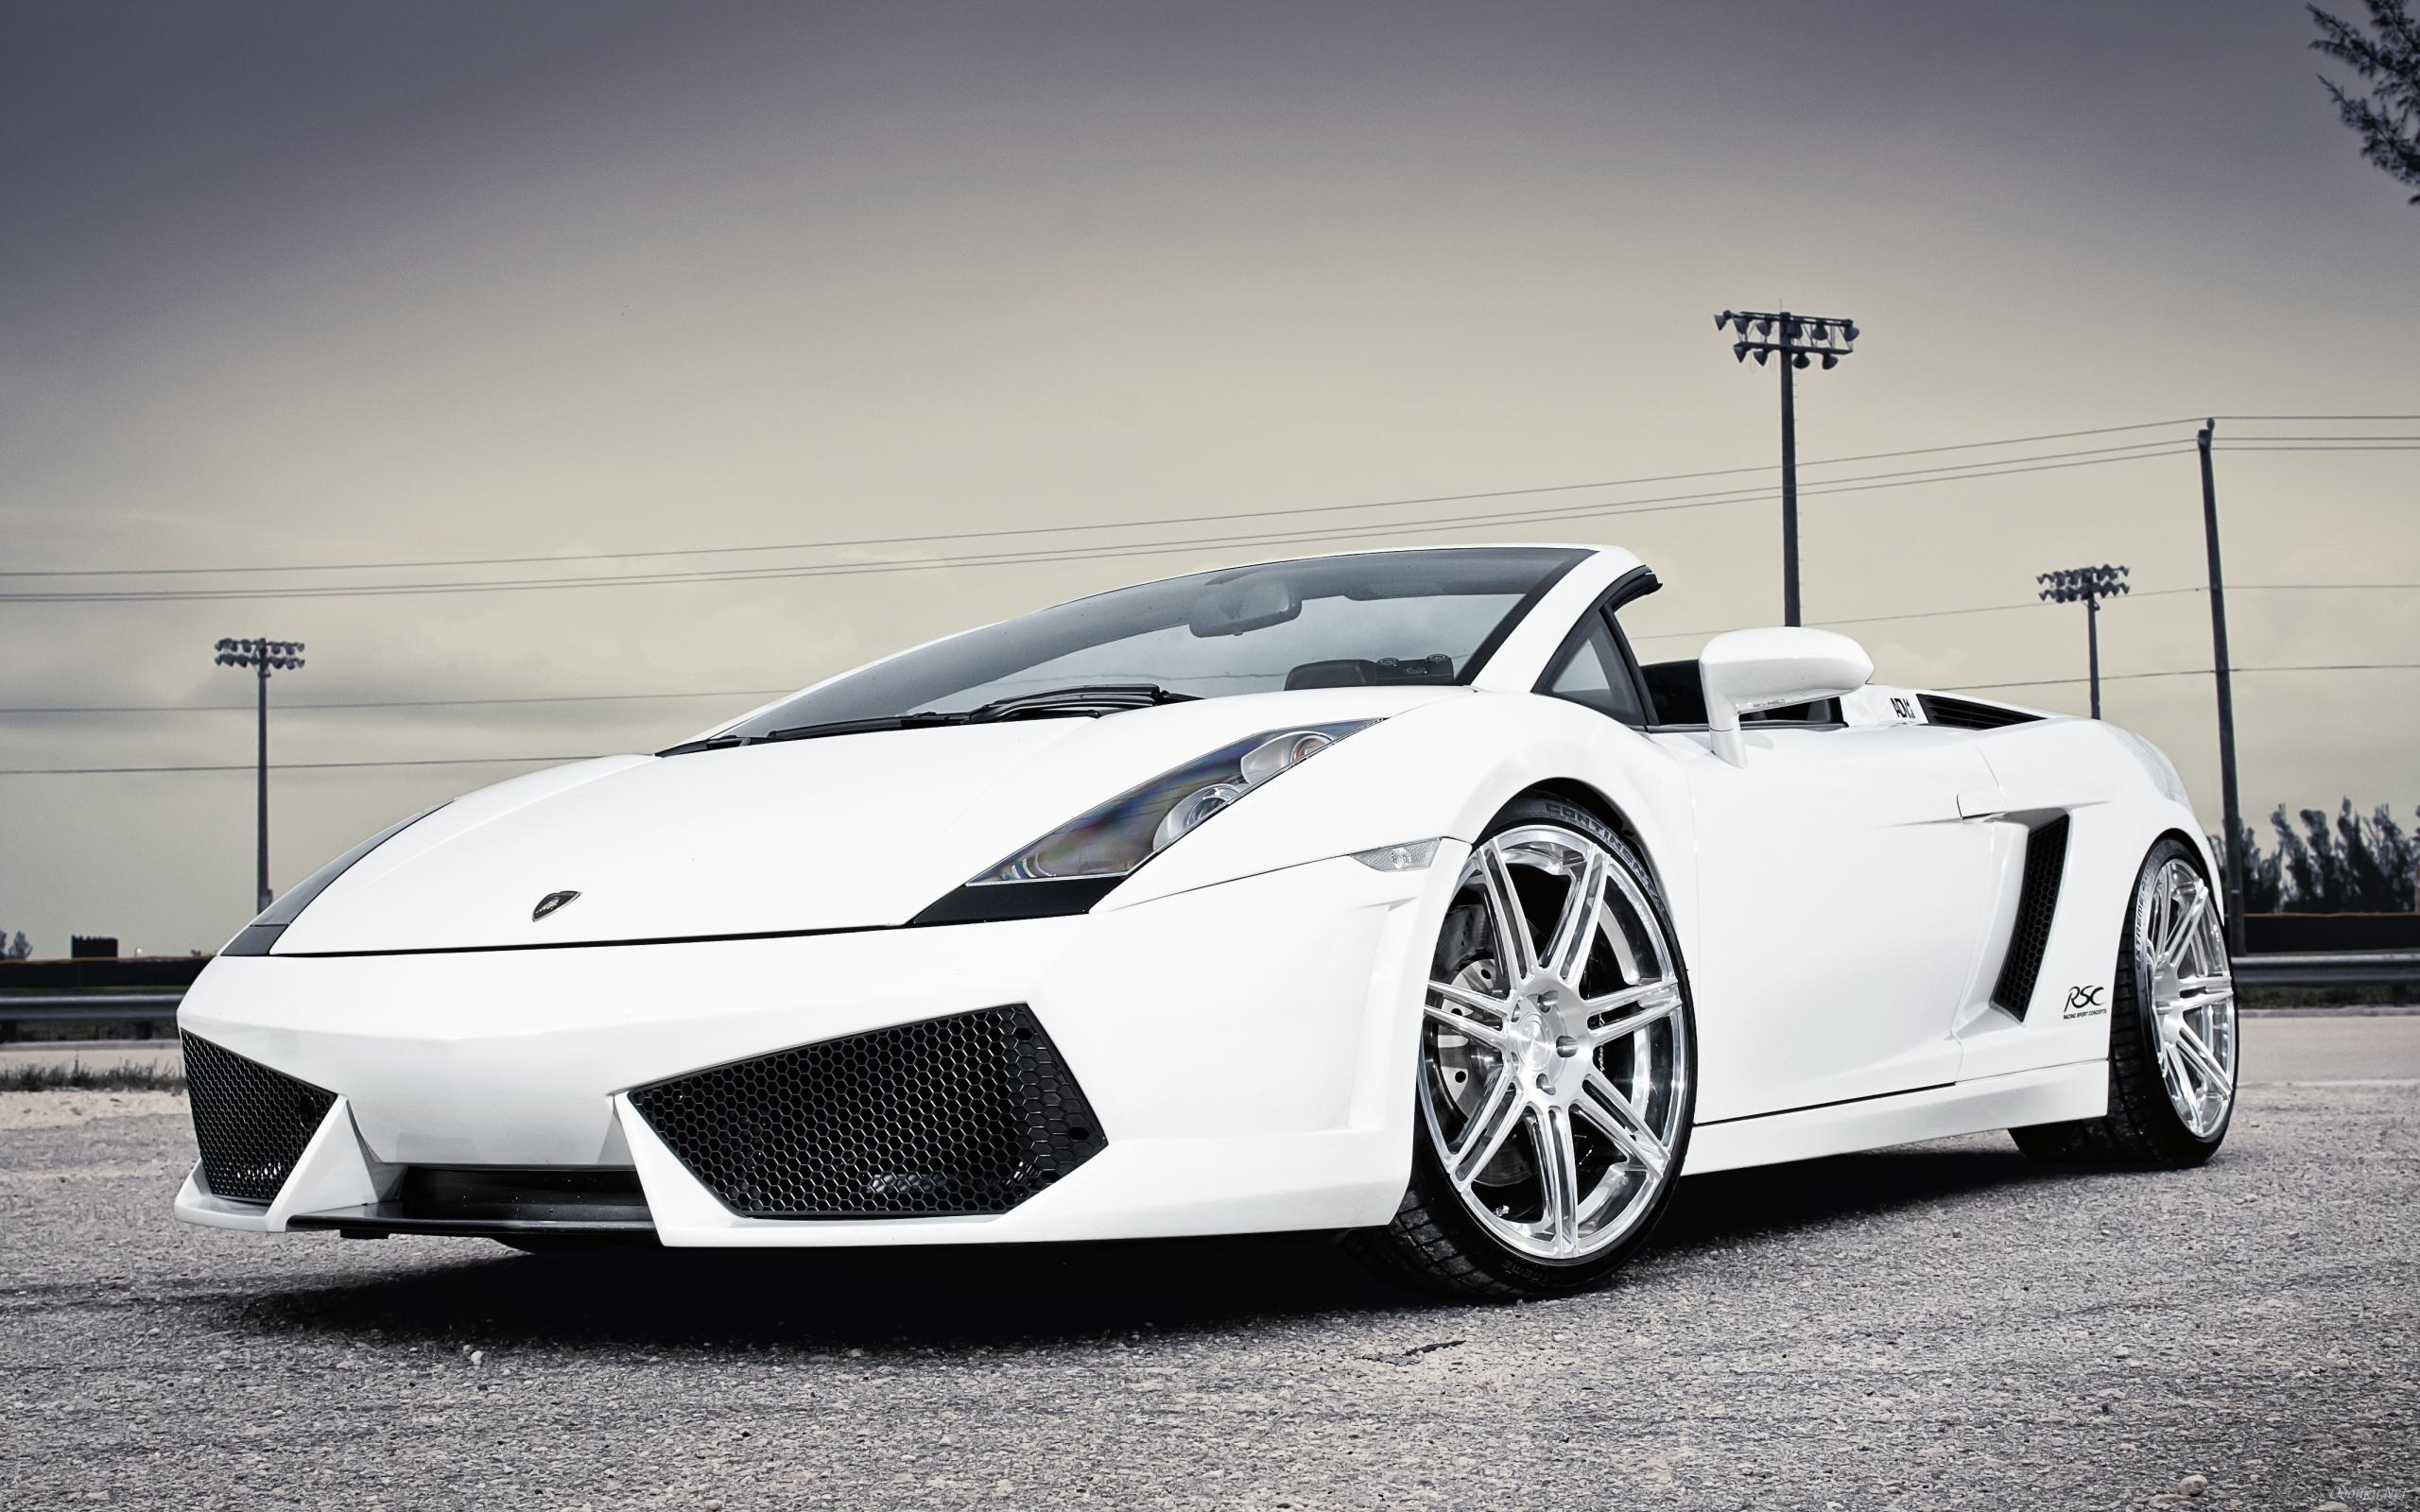 White Lamborghini Gallardo HD Desktop Wallpaper HD Desktop Wallpaper 2560x1600